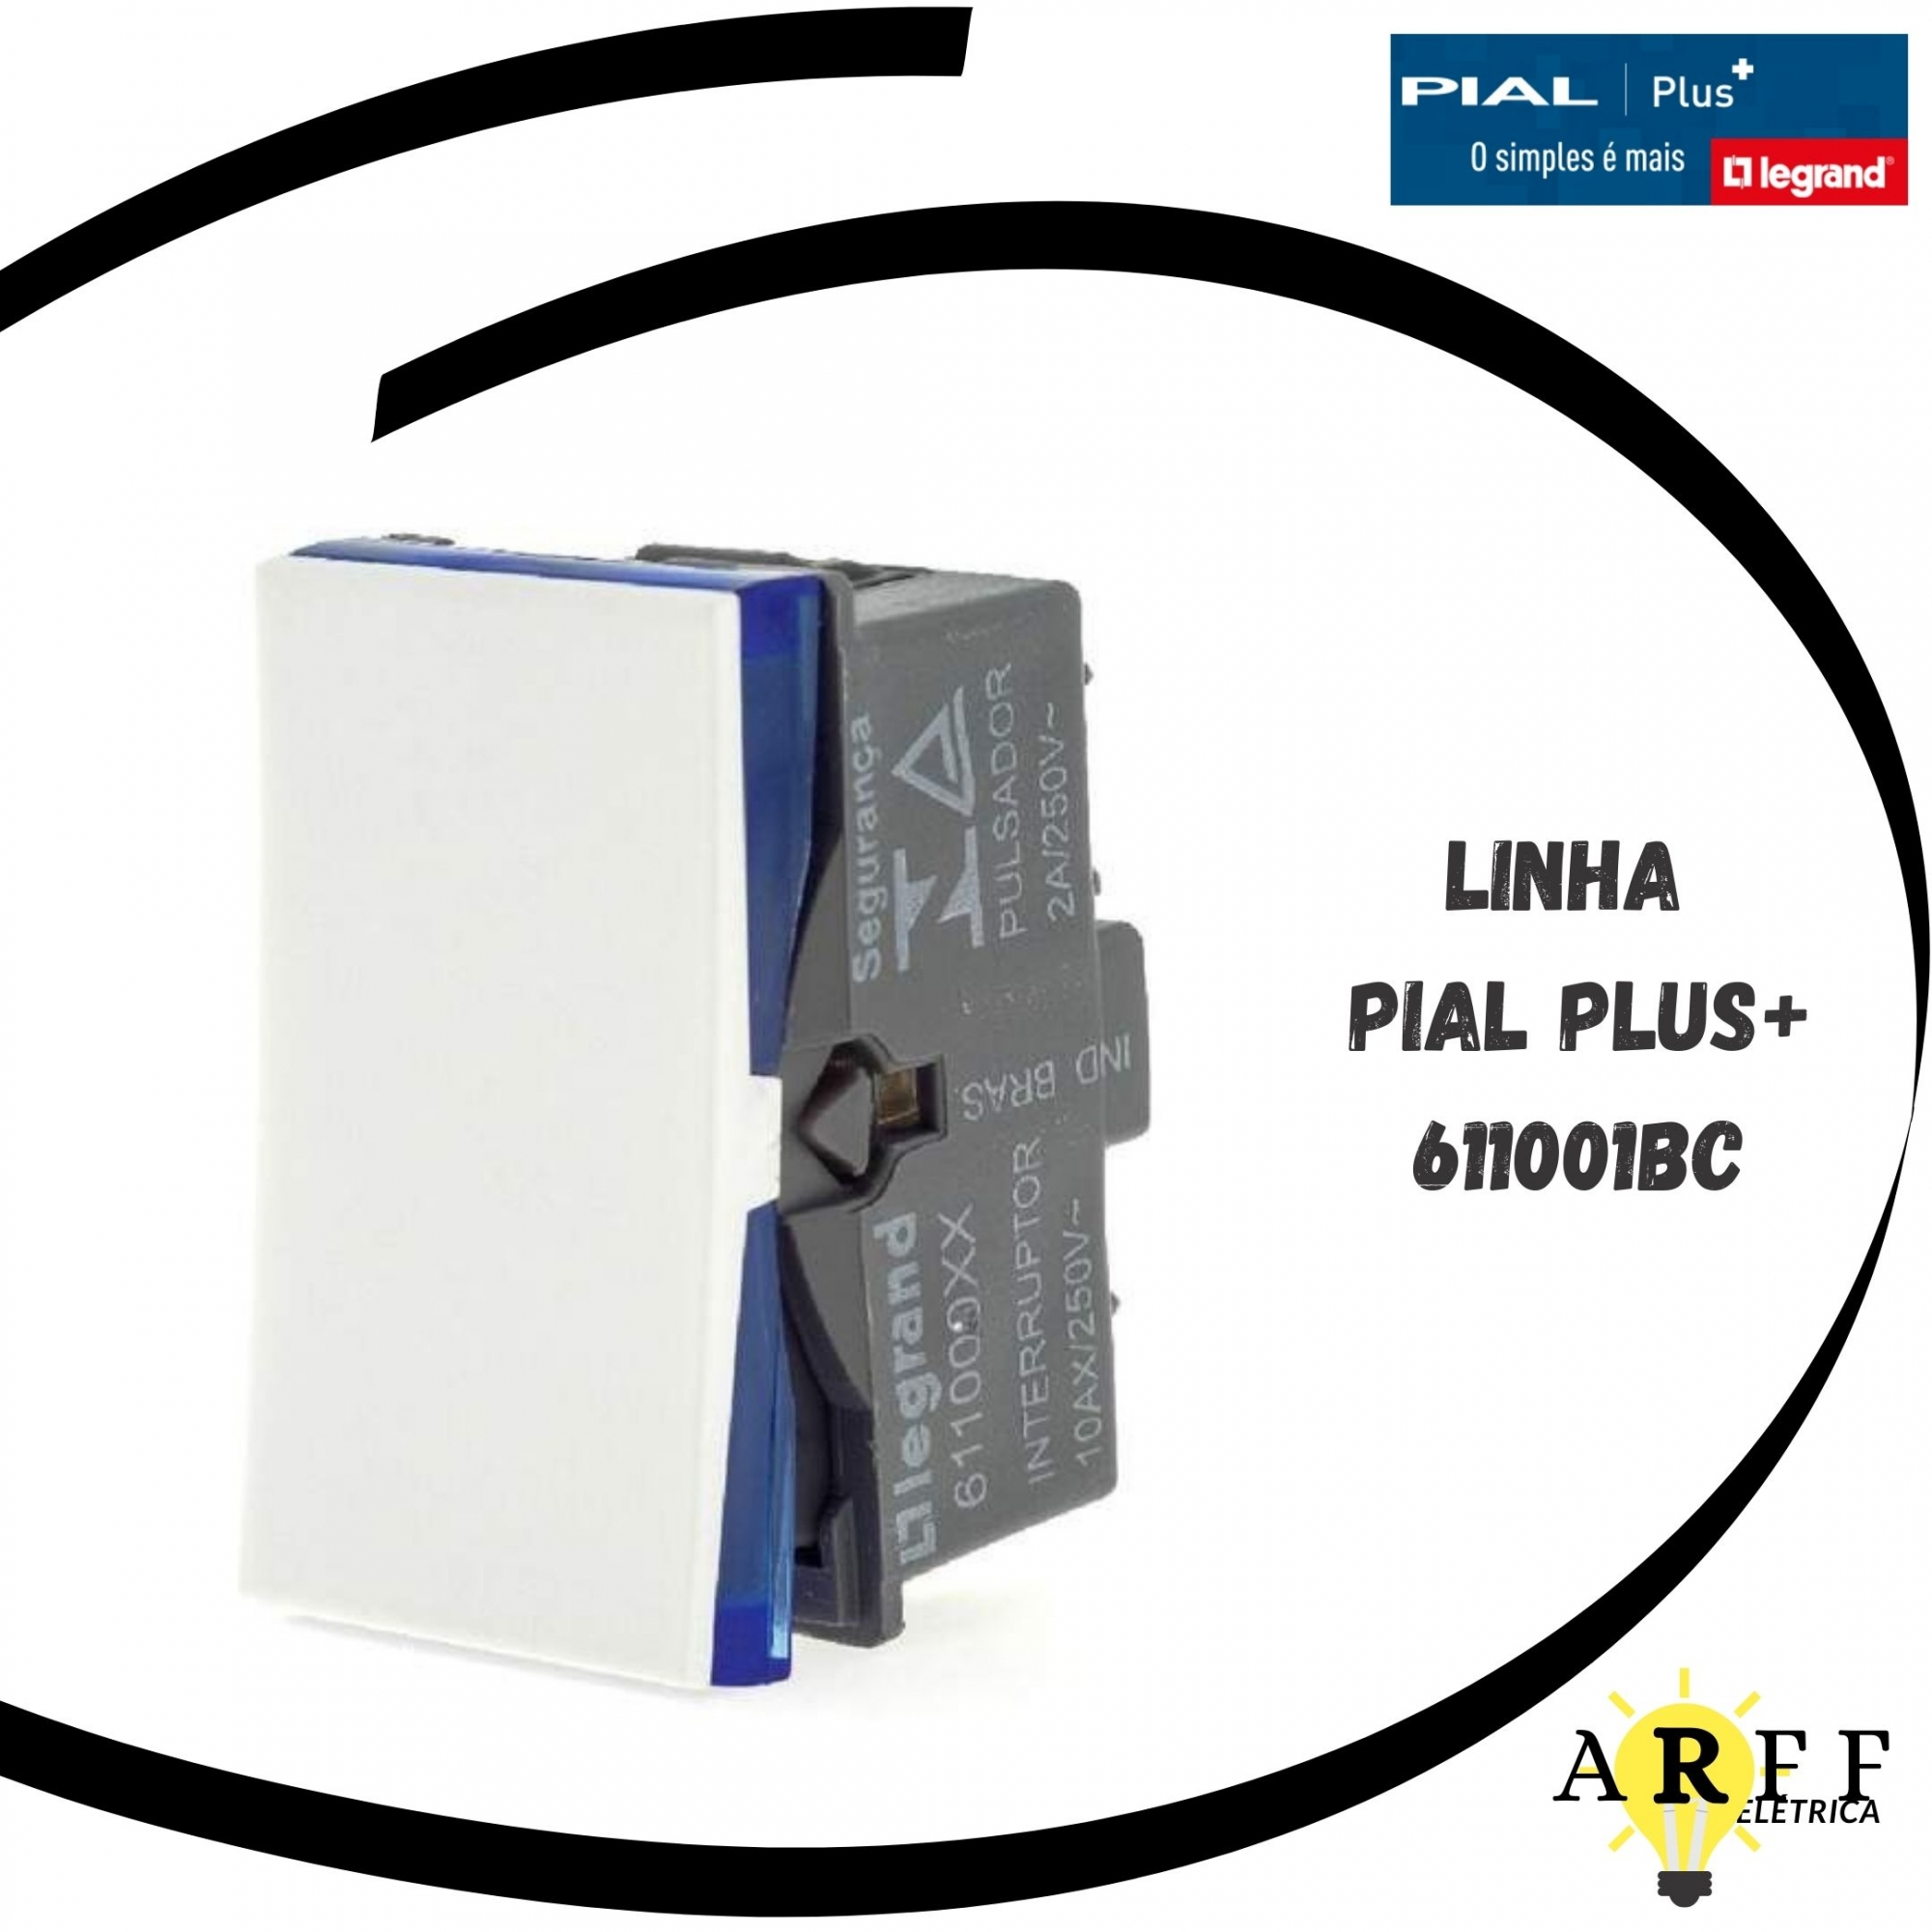 611001BC - Módulo Interruptor Paralelo 10A PialPlus+